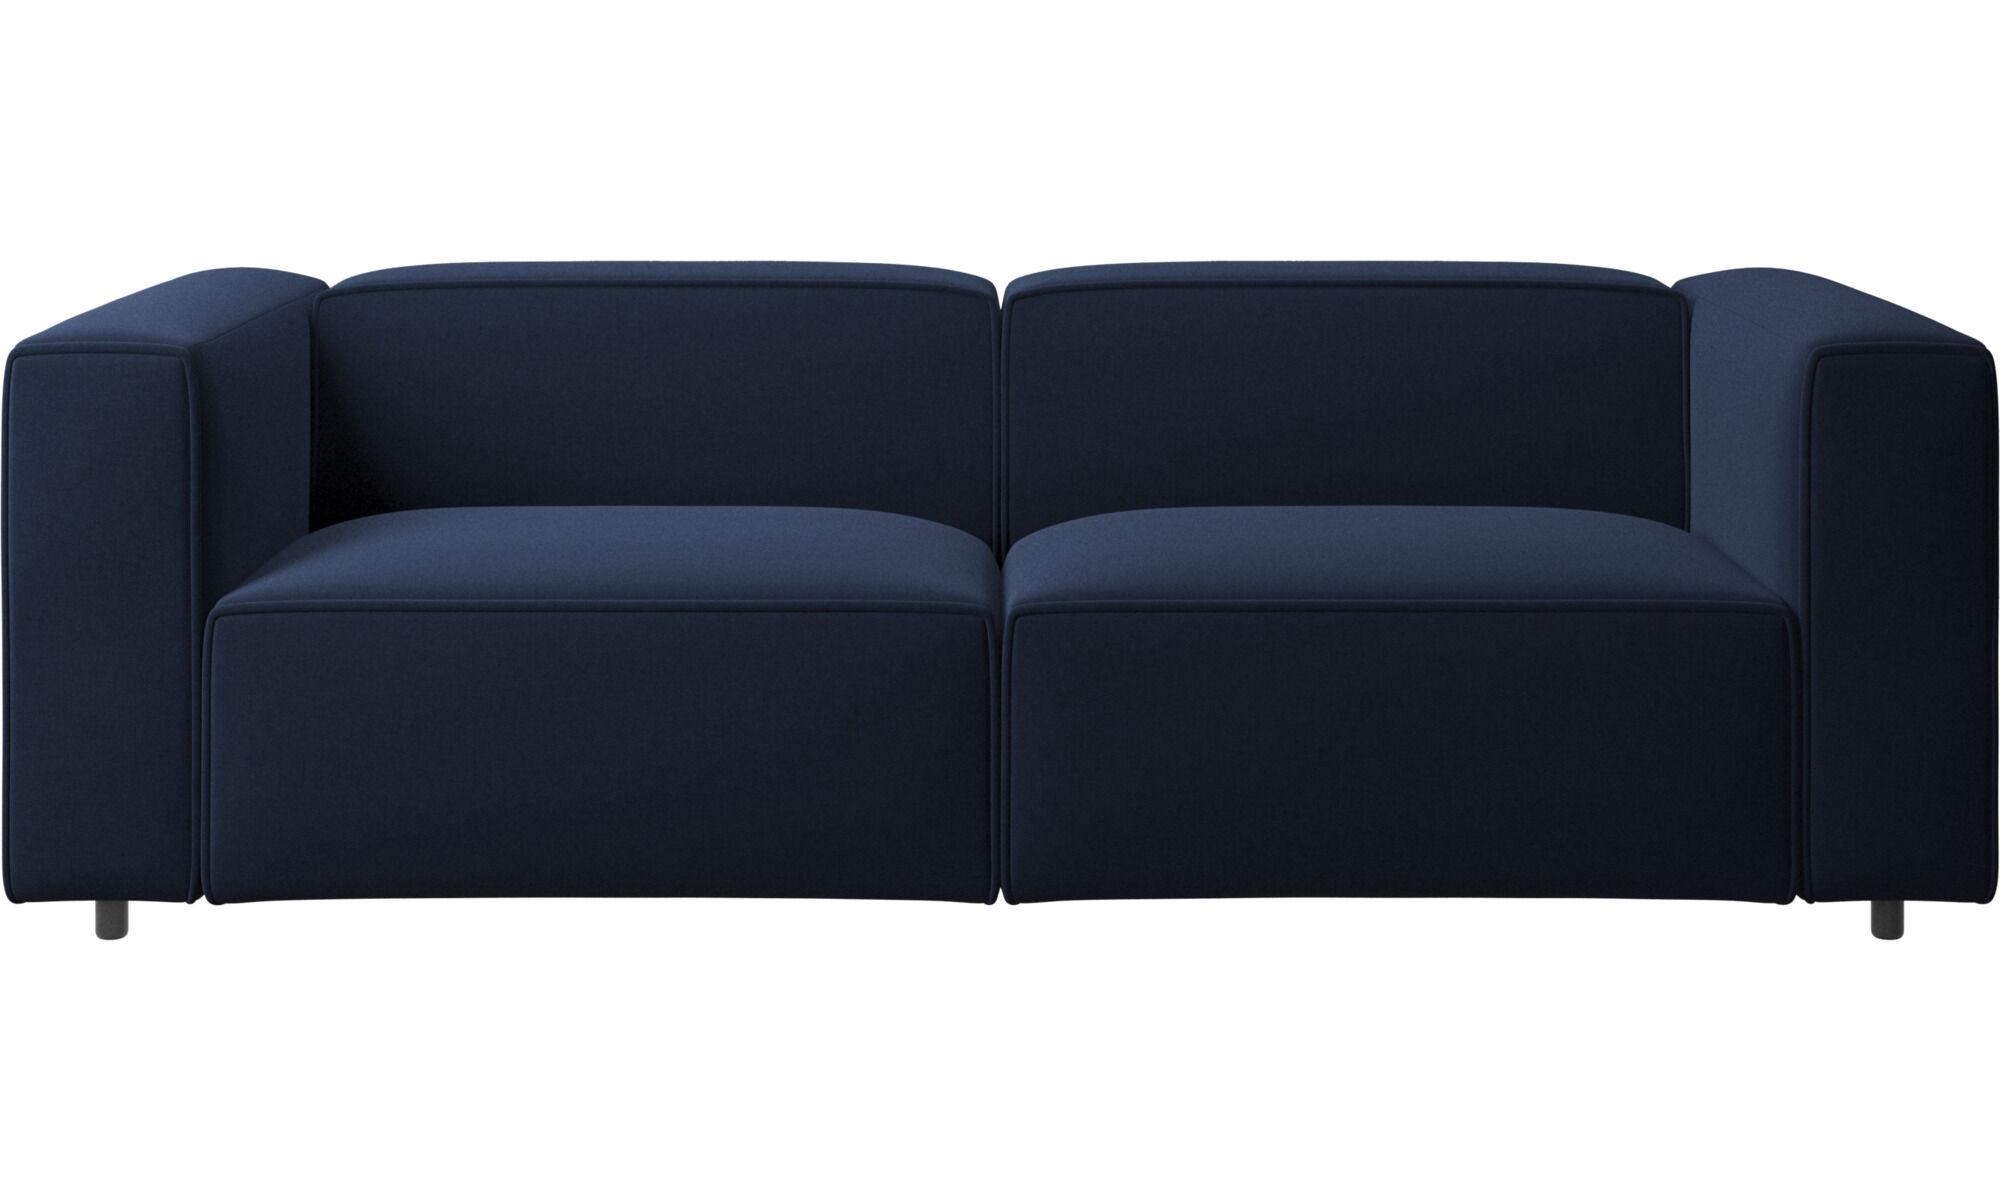 2.5 Seater Sofas   Carmo Sofa   Blue   Fabric